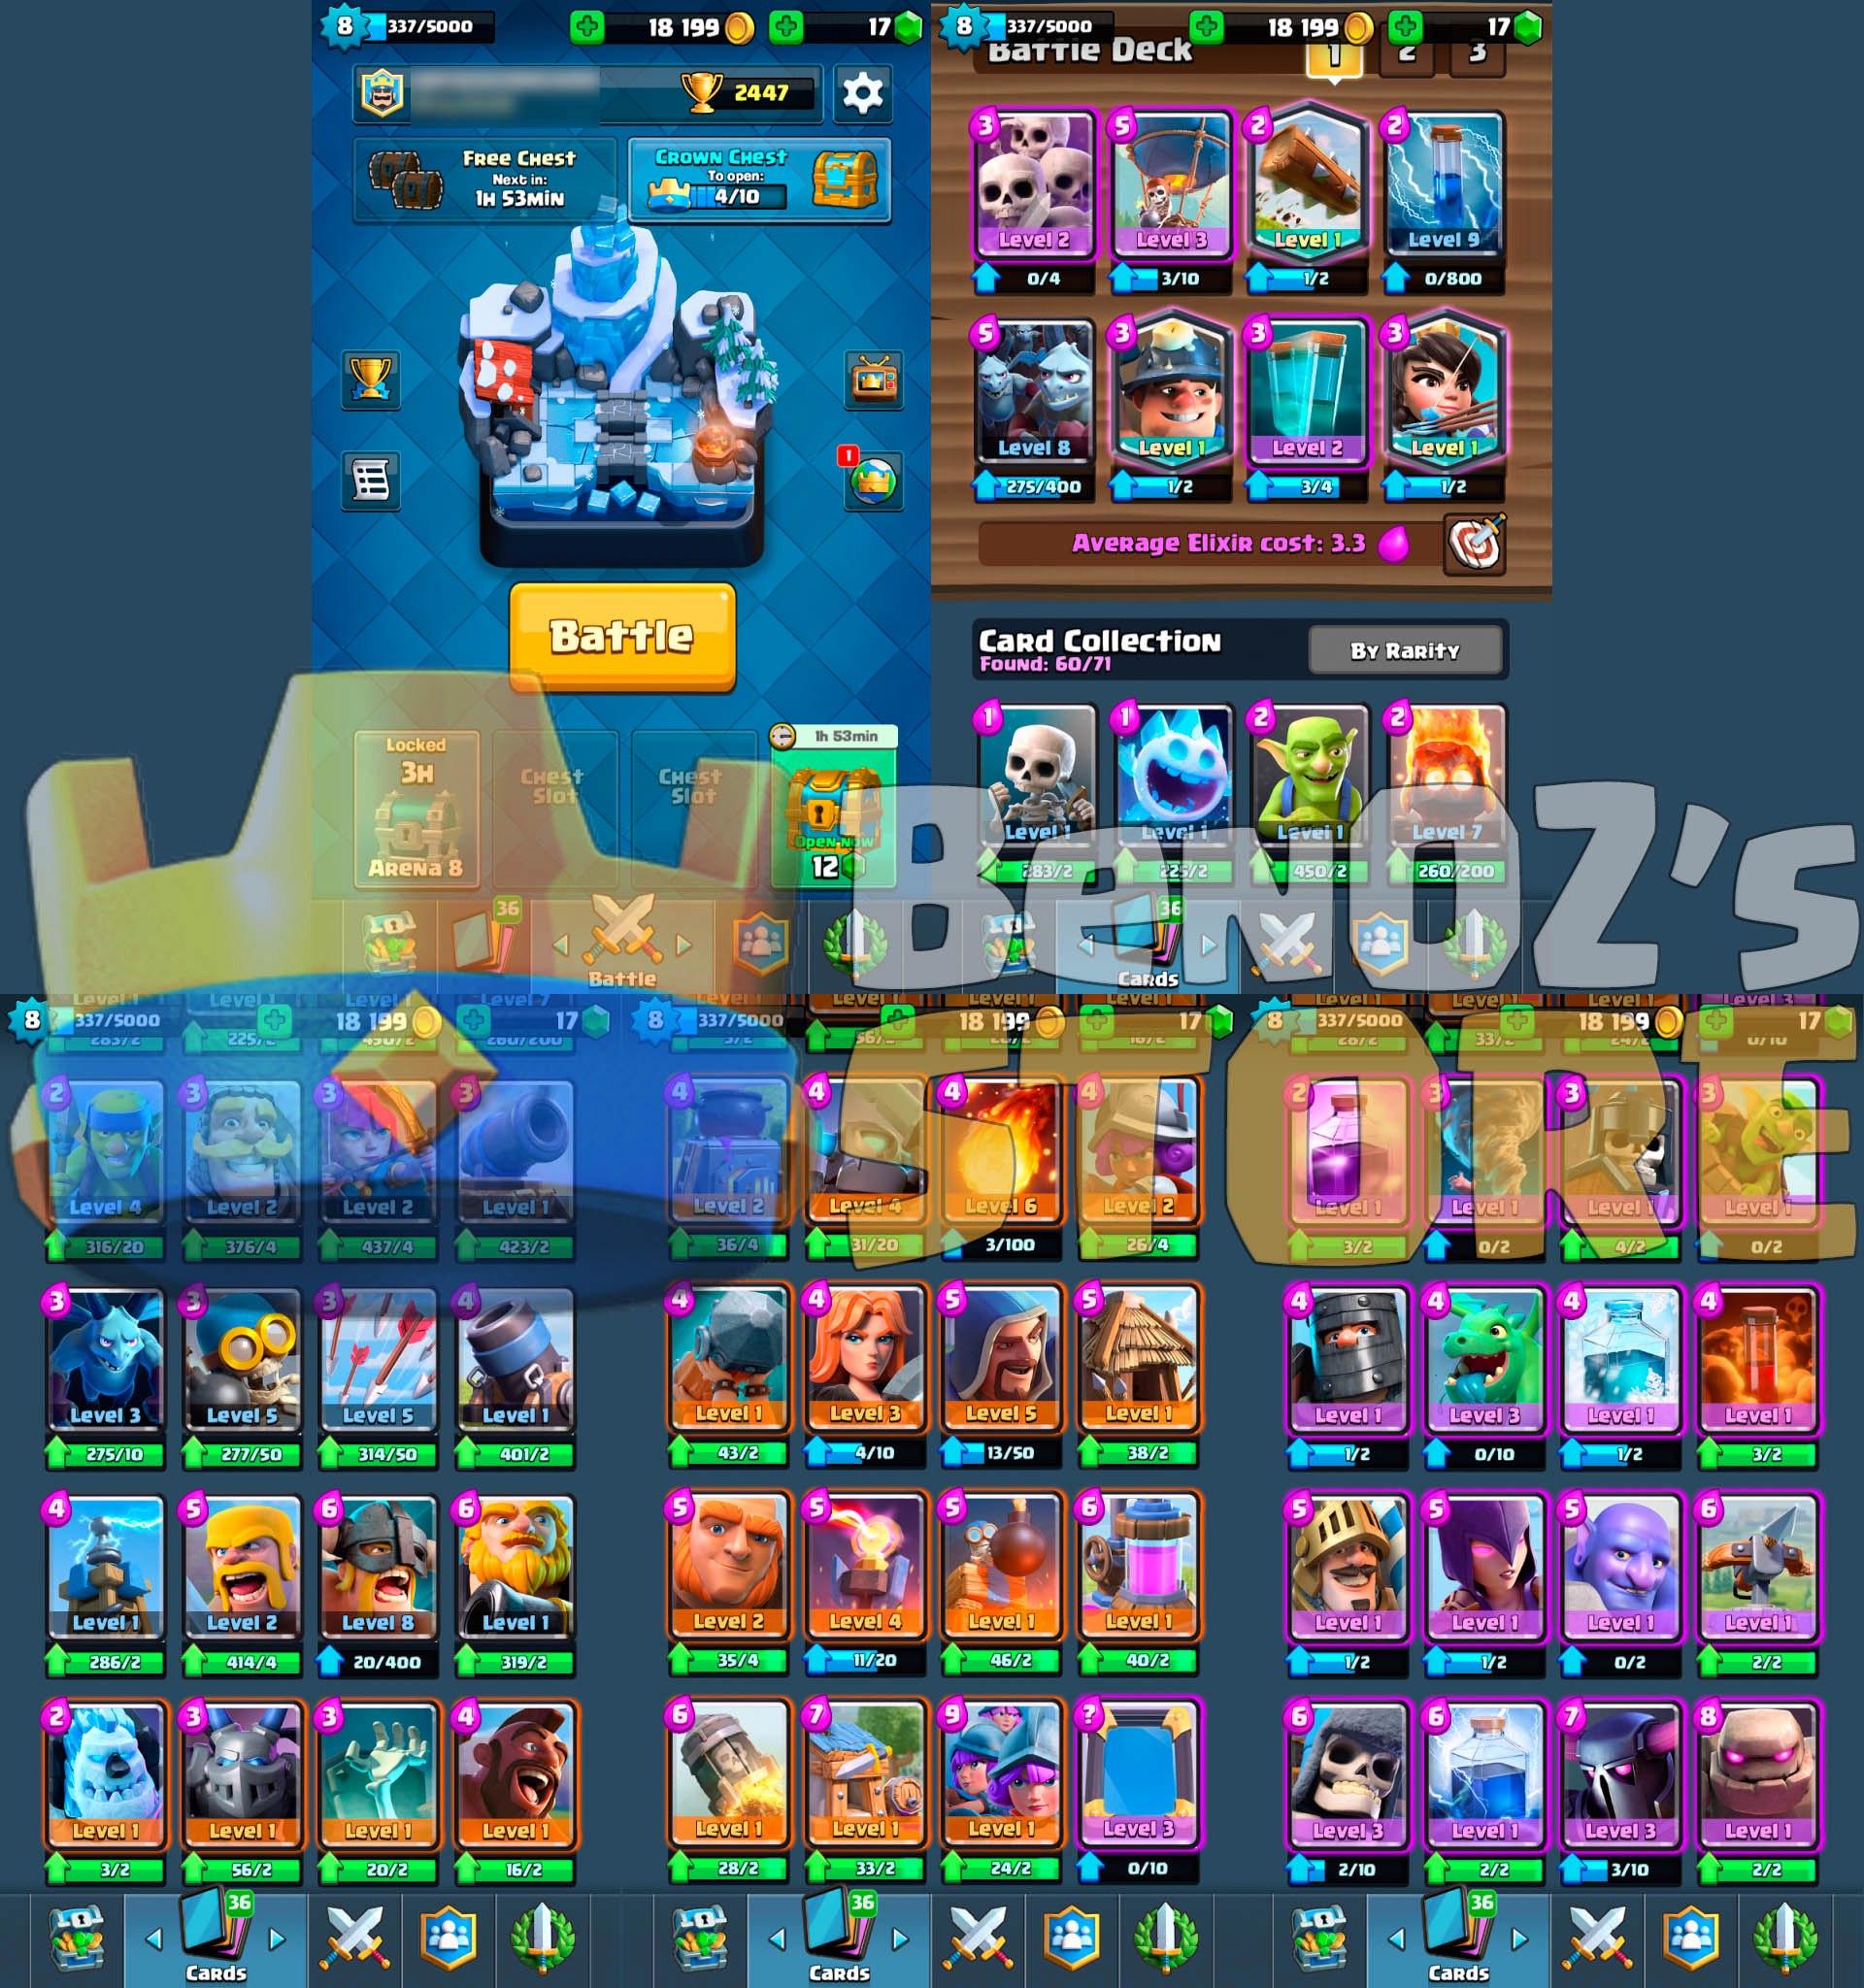 Sold - Lvl 8: MINER, THE LOG, PRINCESS, 18k gold & Arena 8  Android